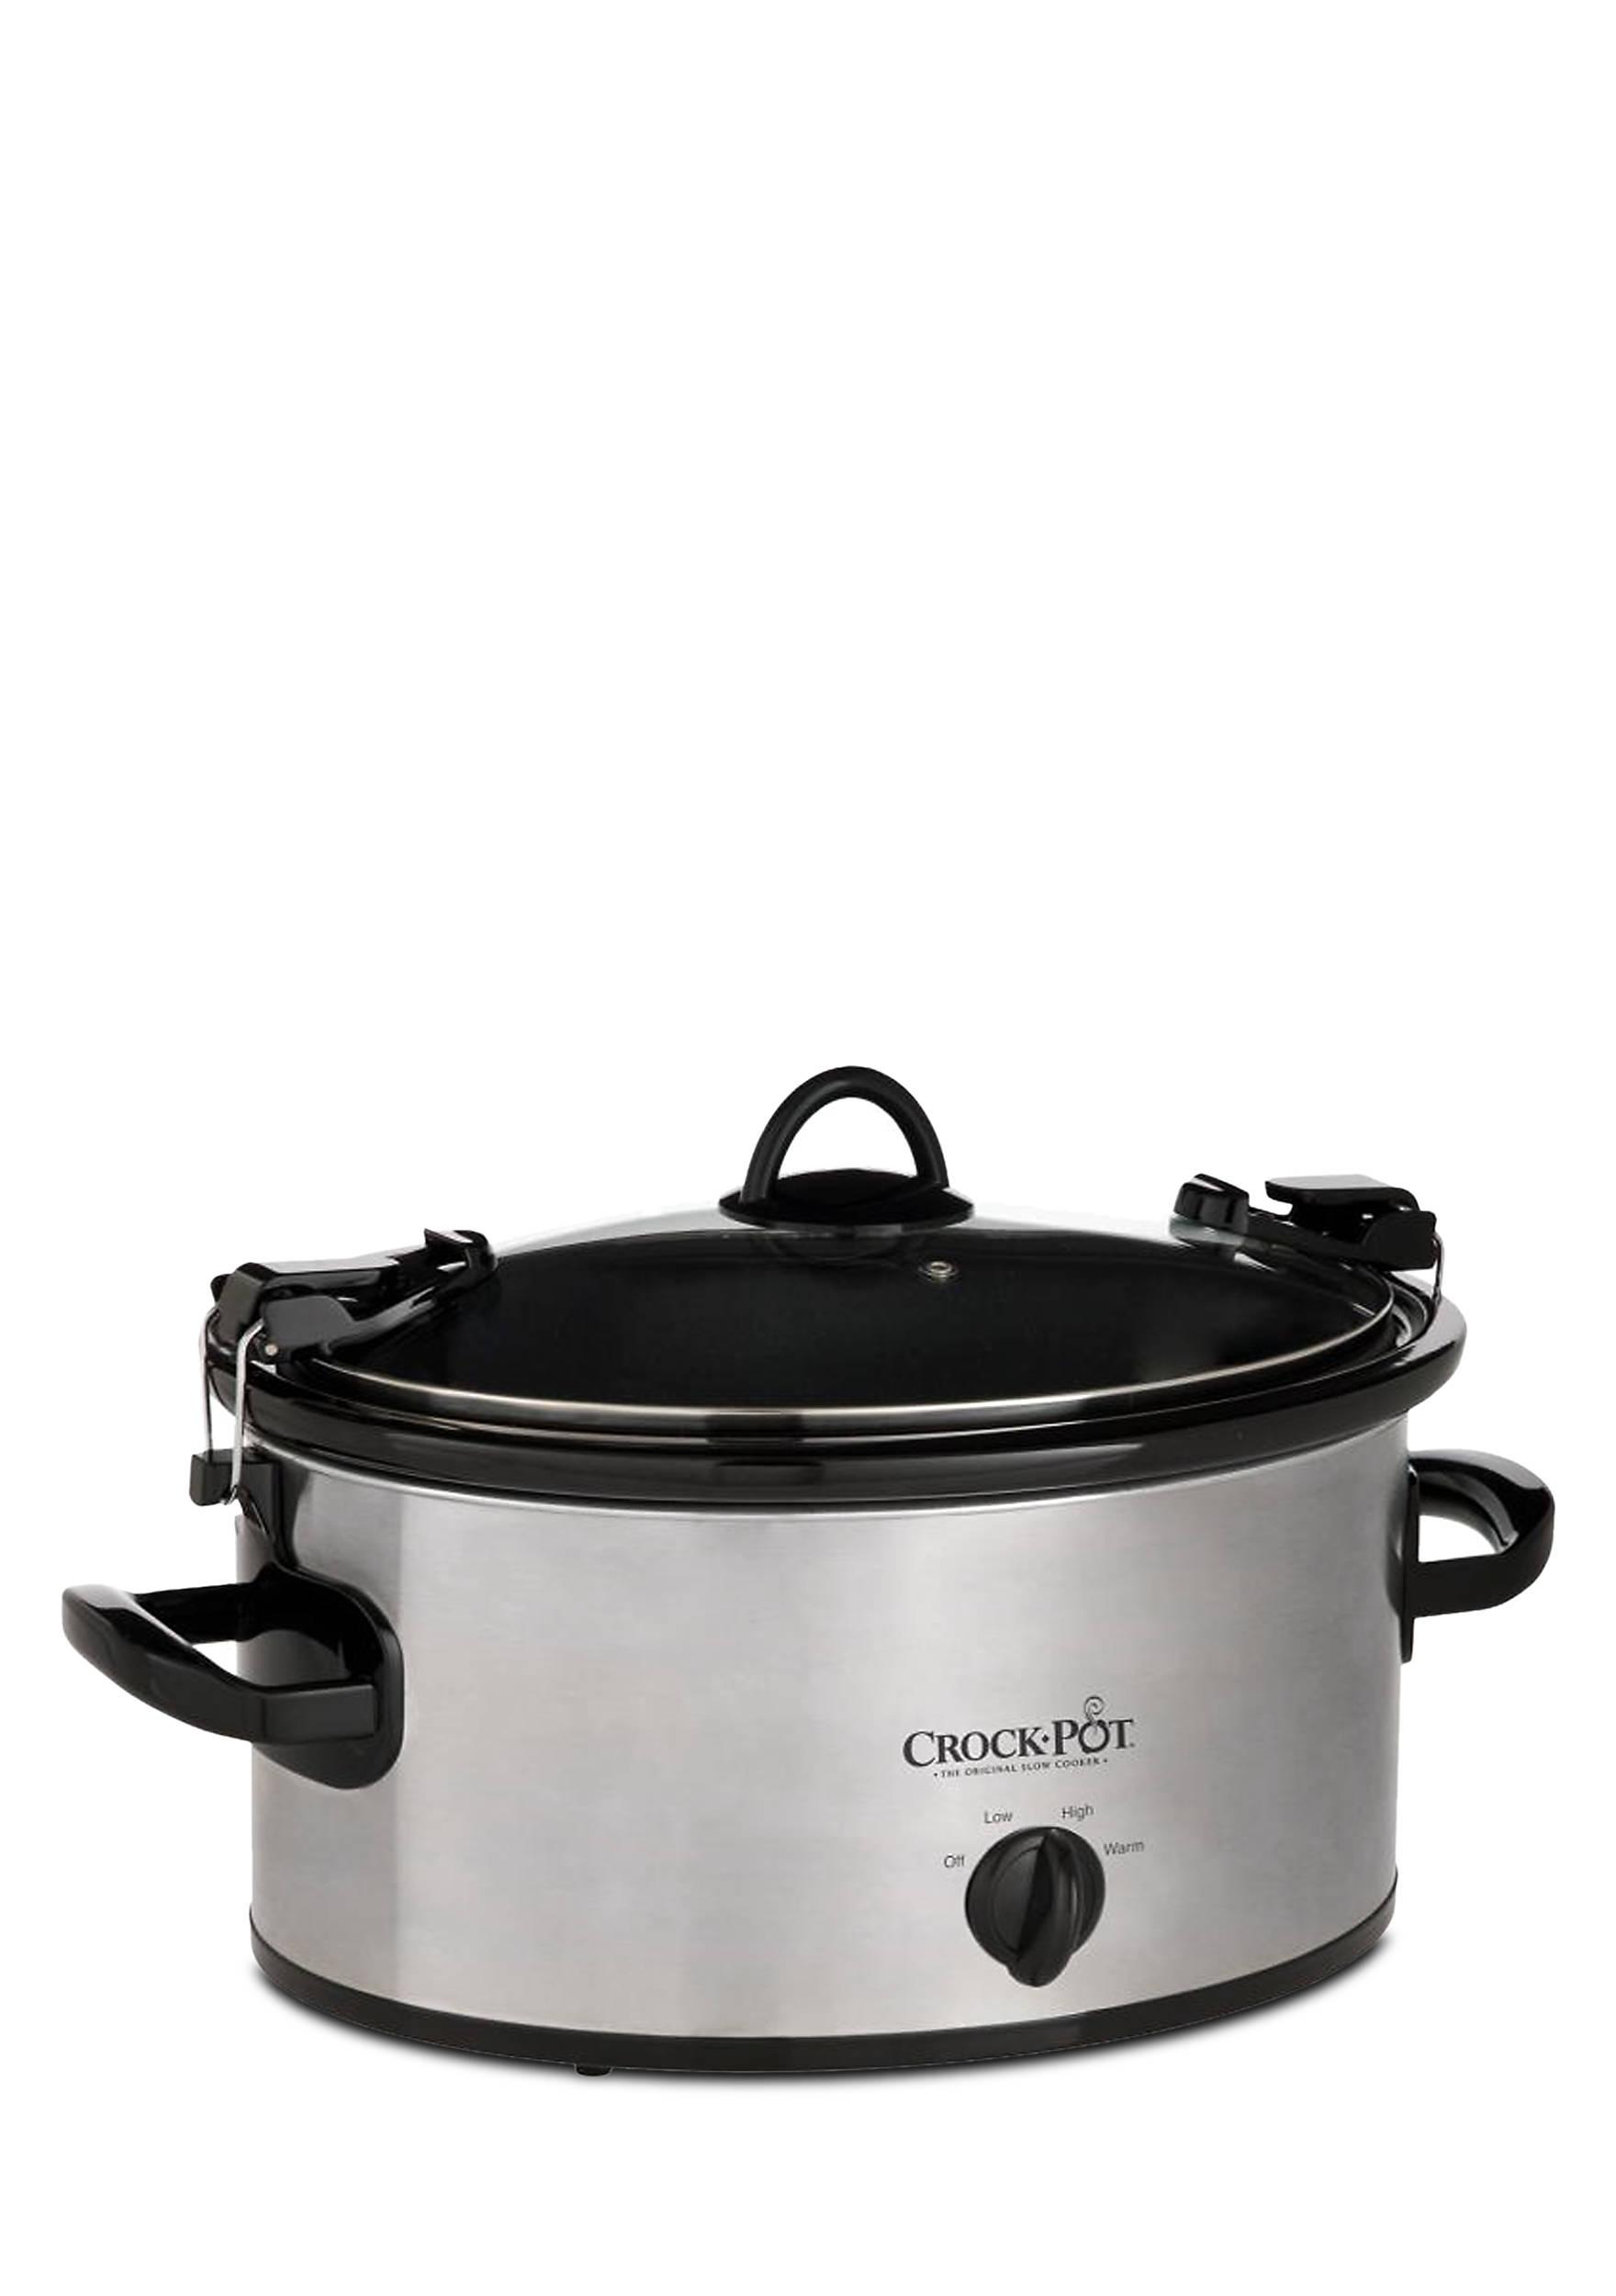 CrockPot 4-qt. Cook & Carry Slow Cooker - SCCPVL400S | belk